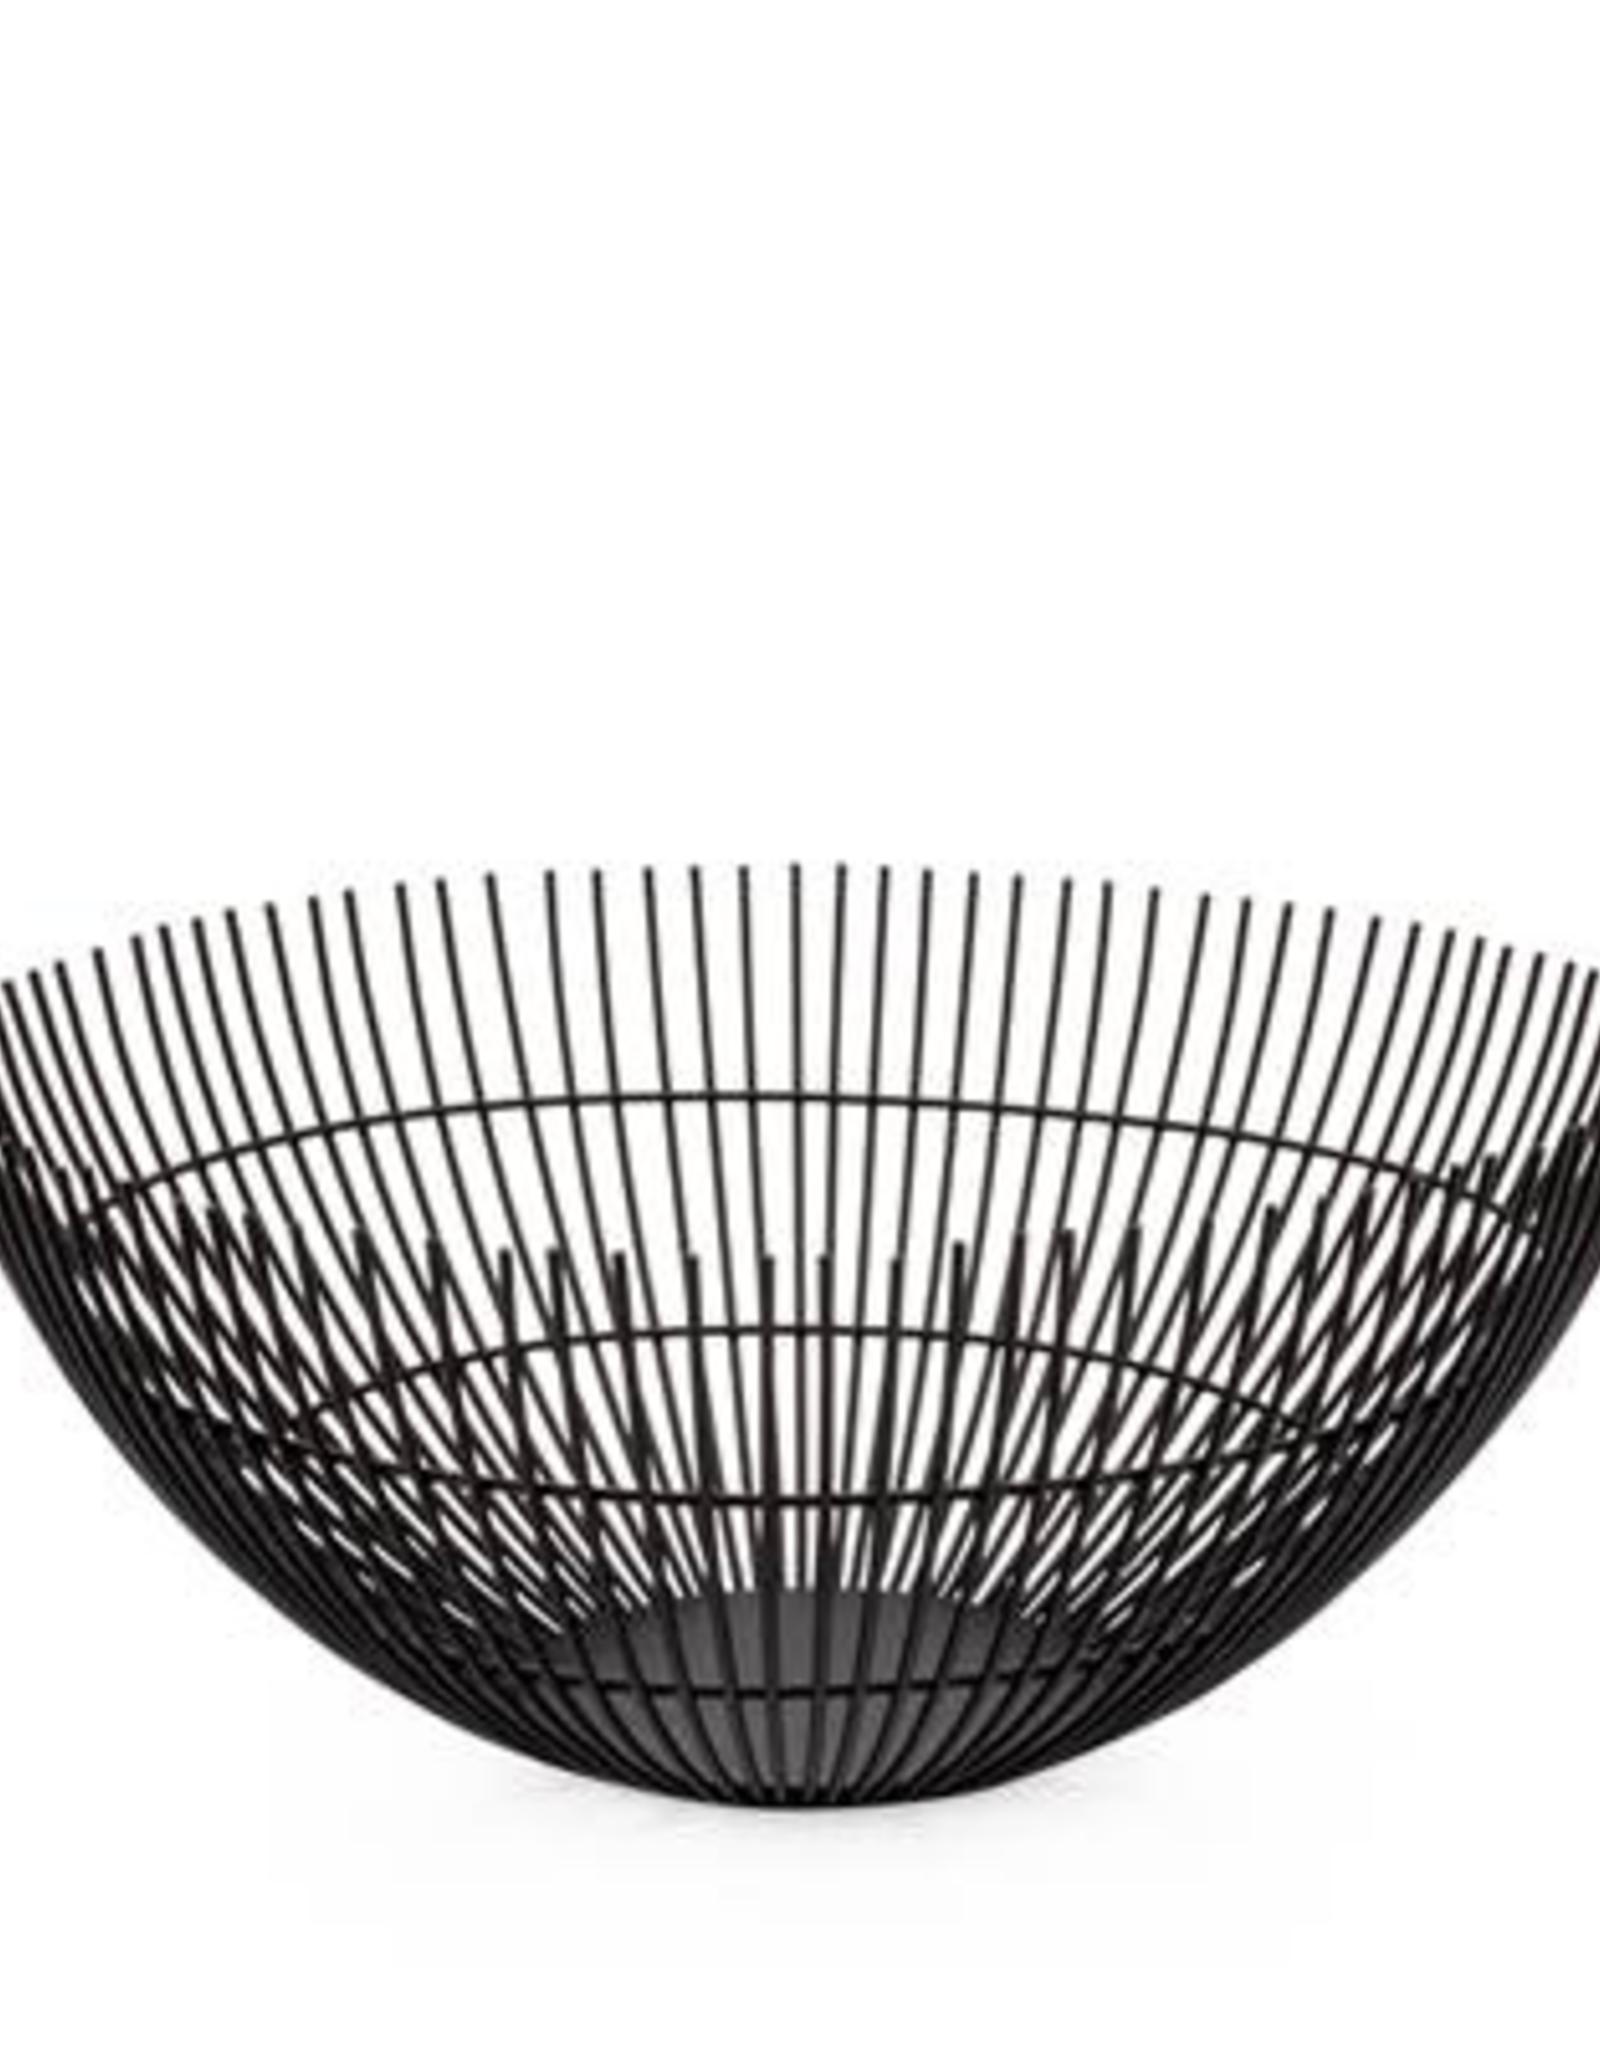 "Basket, Metal, Linear Rib, Black, D11"""